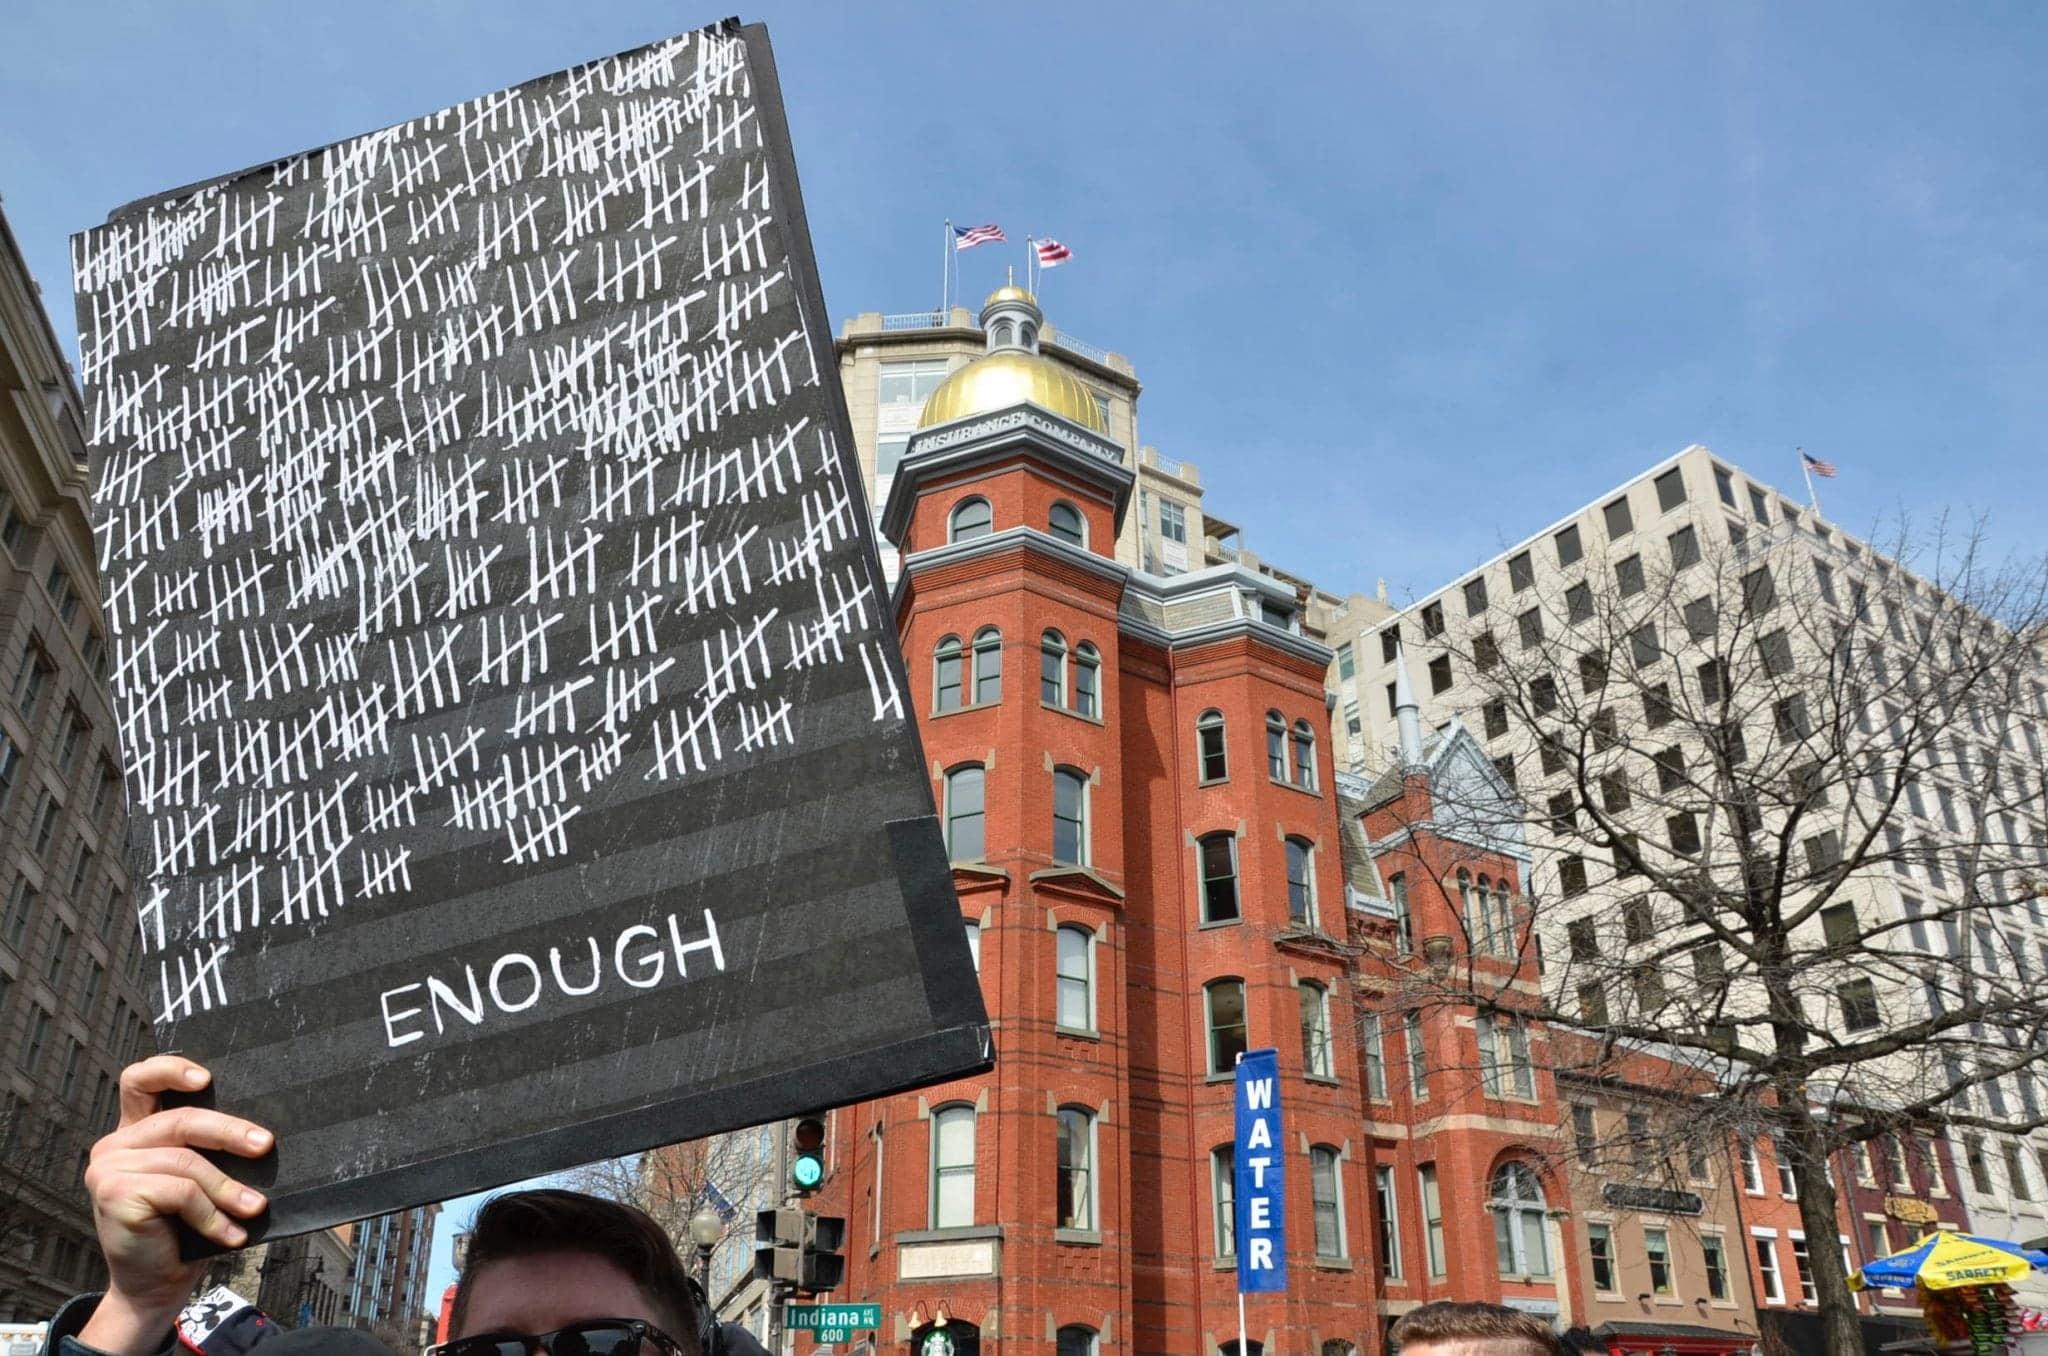 Nate Stevens, marcher from Ann Arbor, Michigan